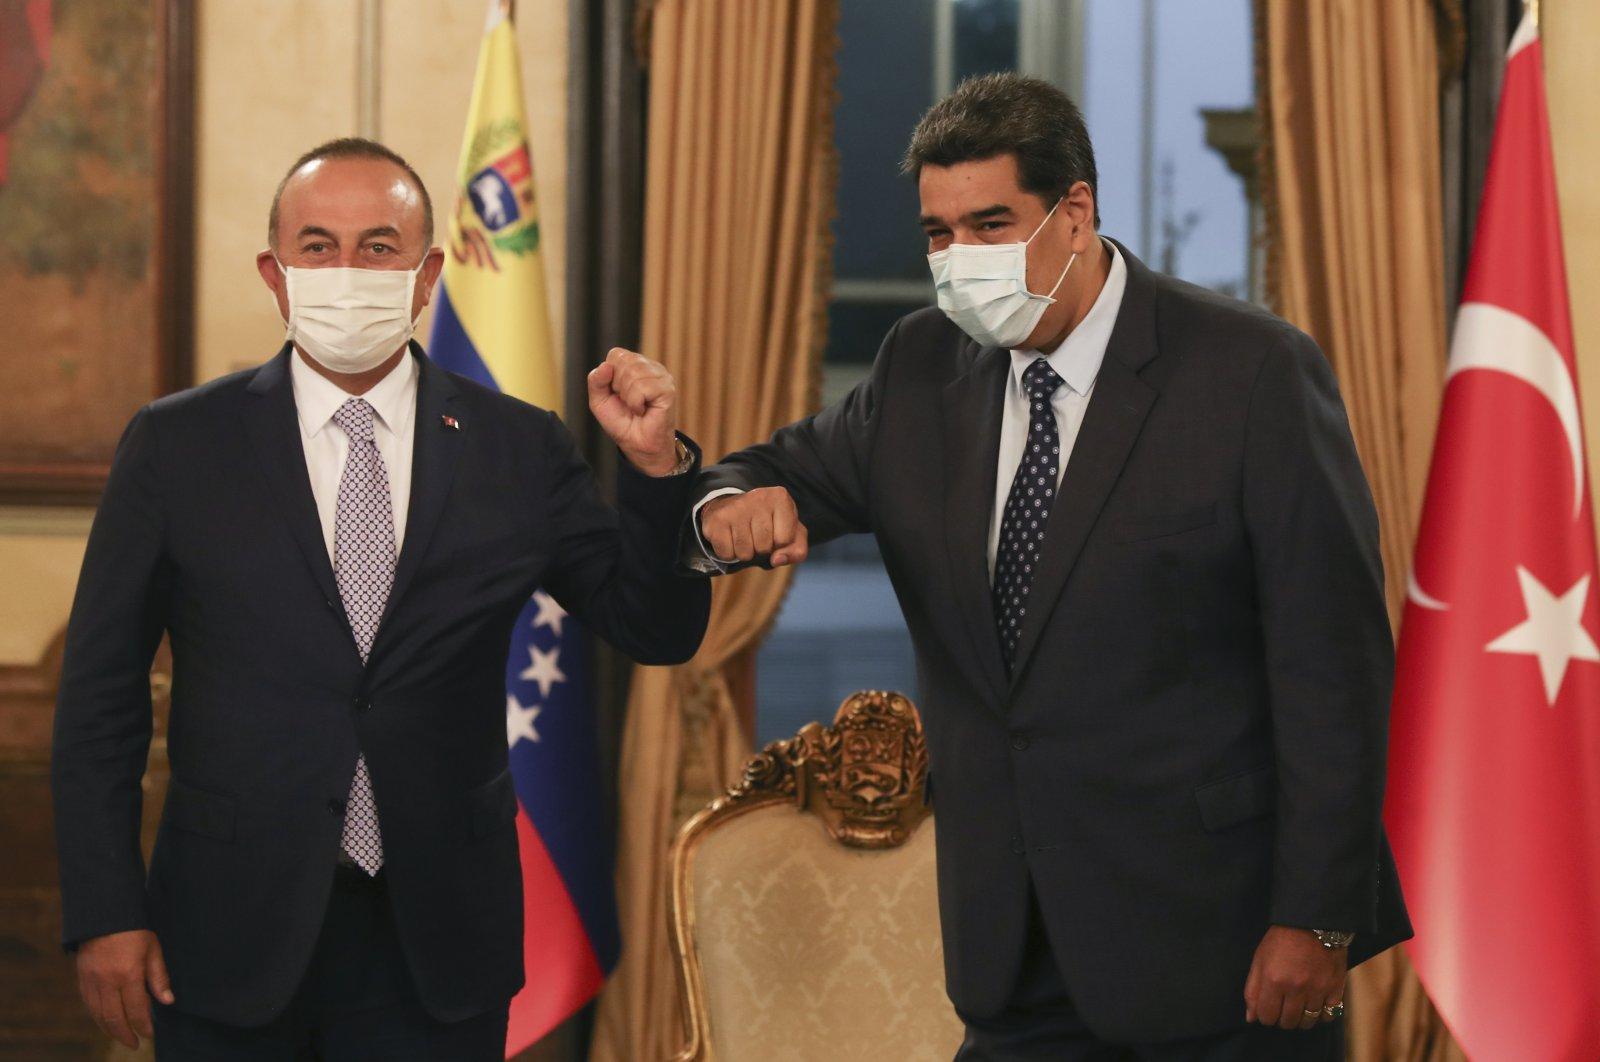 Foreign Minister Mevlüt Çavuşoğlu and Venezuela's President Nicolas Maduro touch elbows as they pose for photos before their talks, in Caracas, Venezuela, Aug. 18, 2020. (AP Photo)